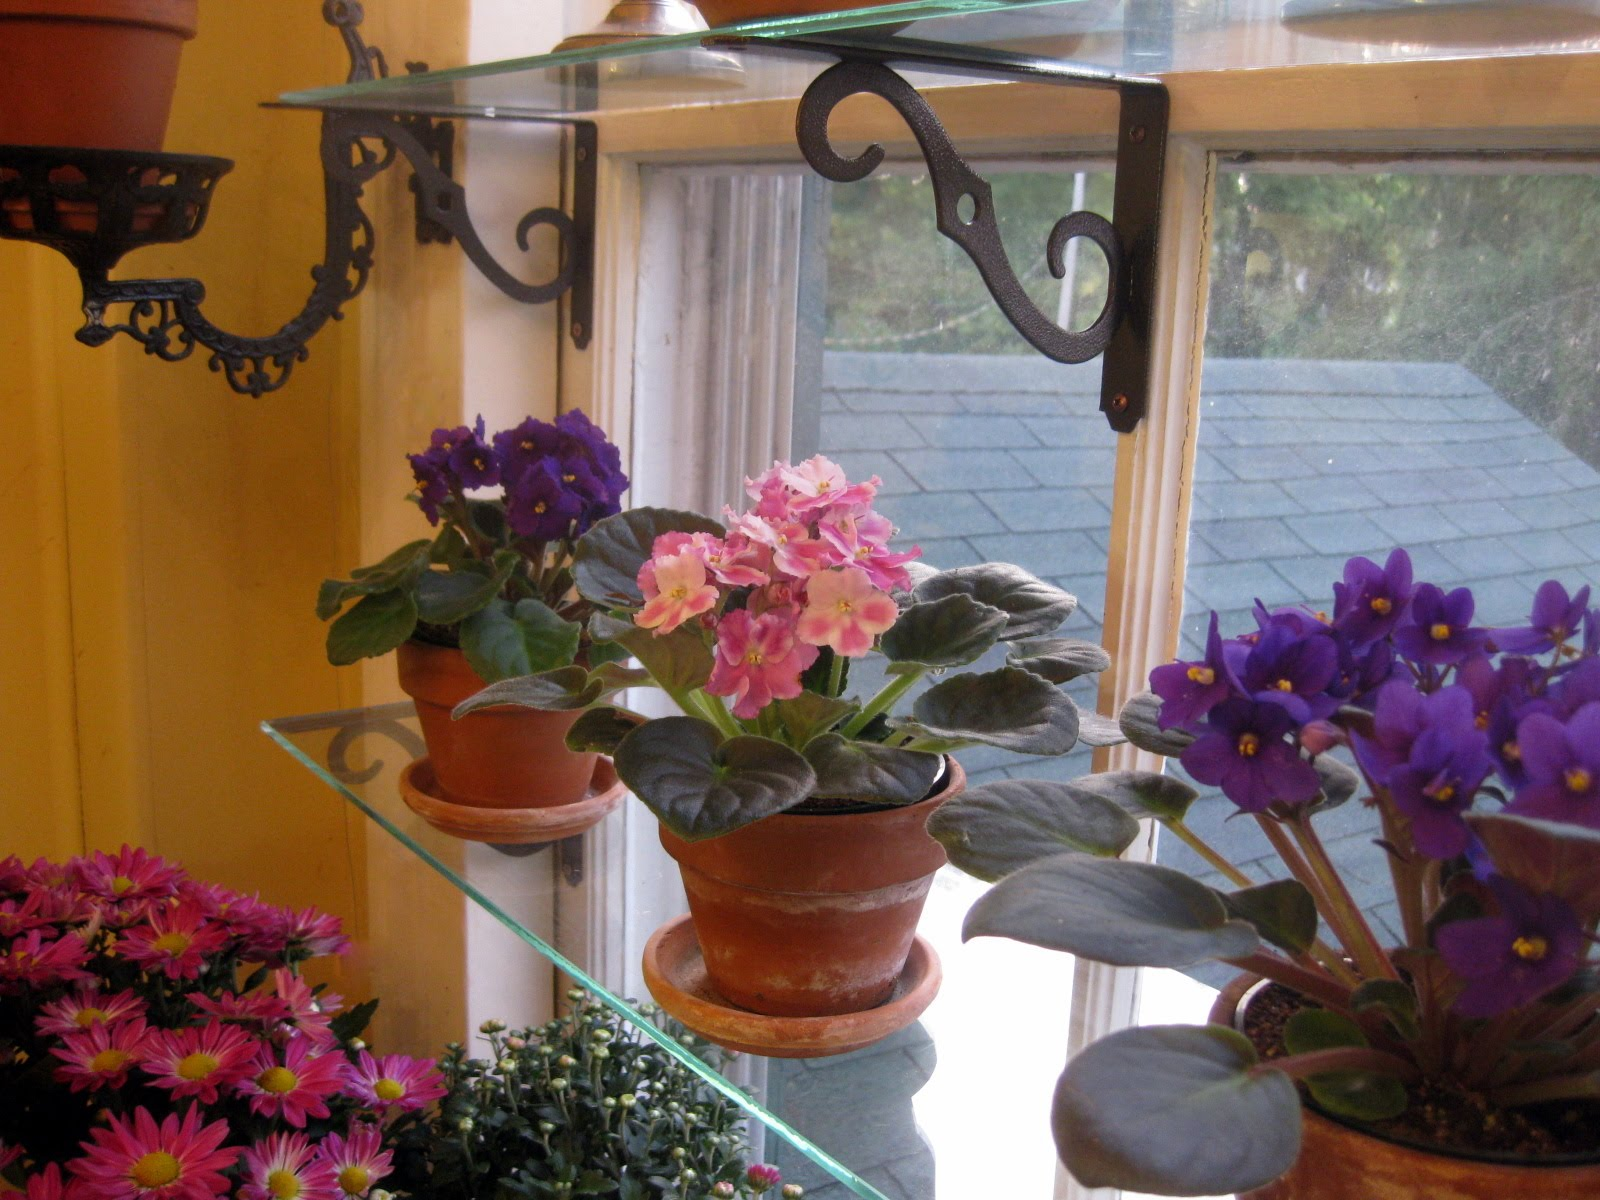 The Window Garden in Autumn